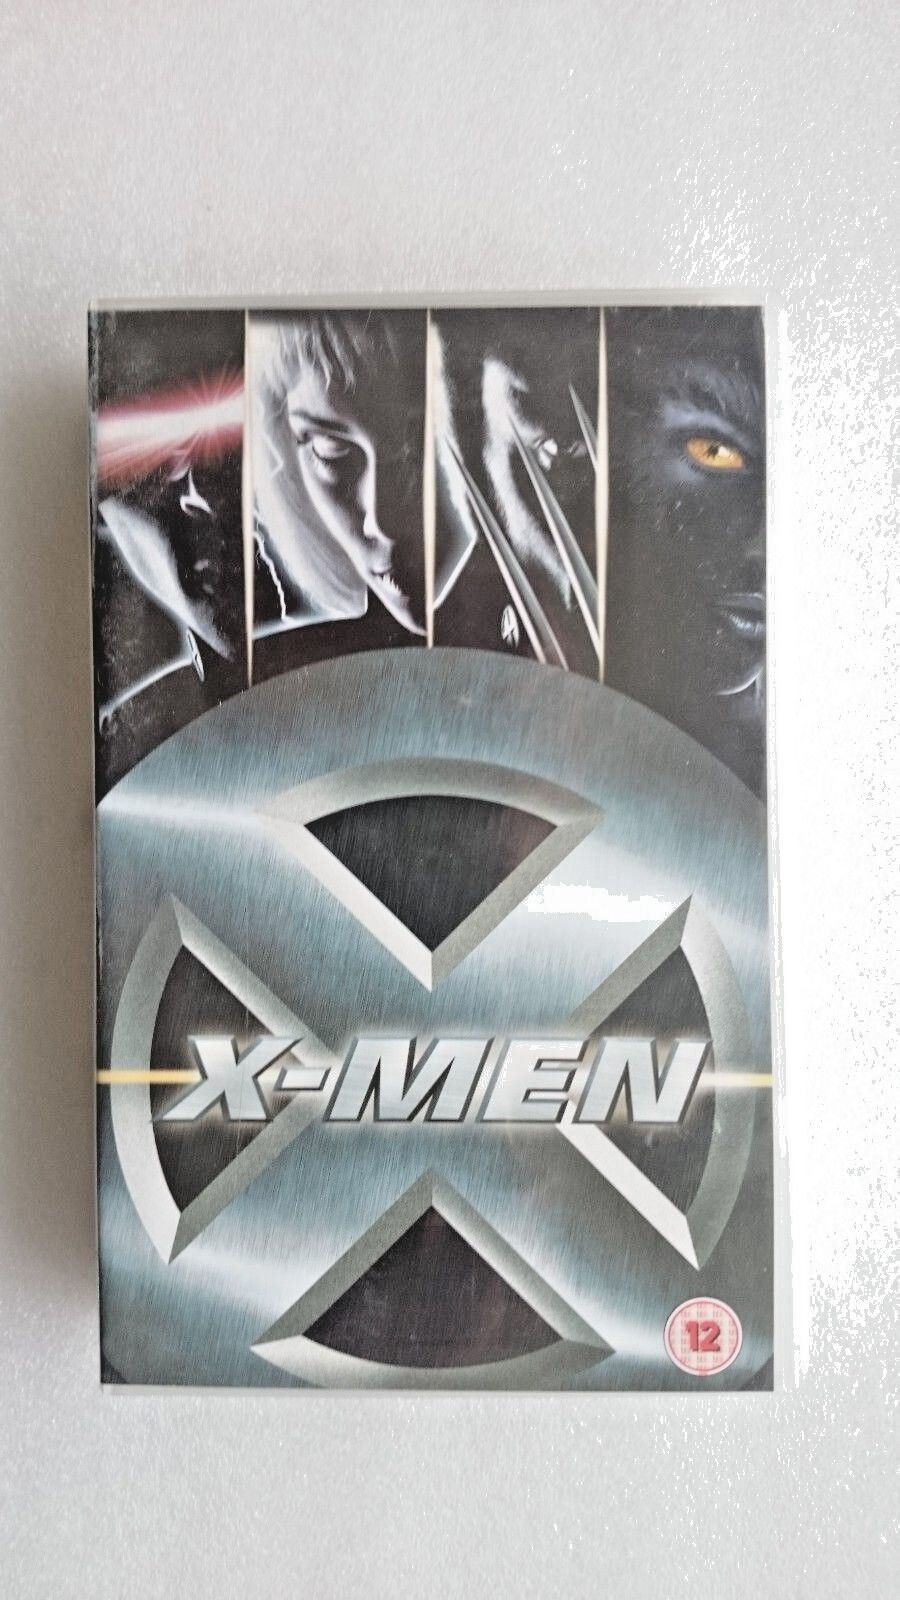 X-Men (VHS, 2001)